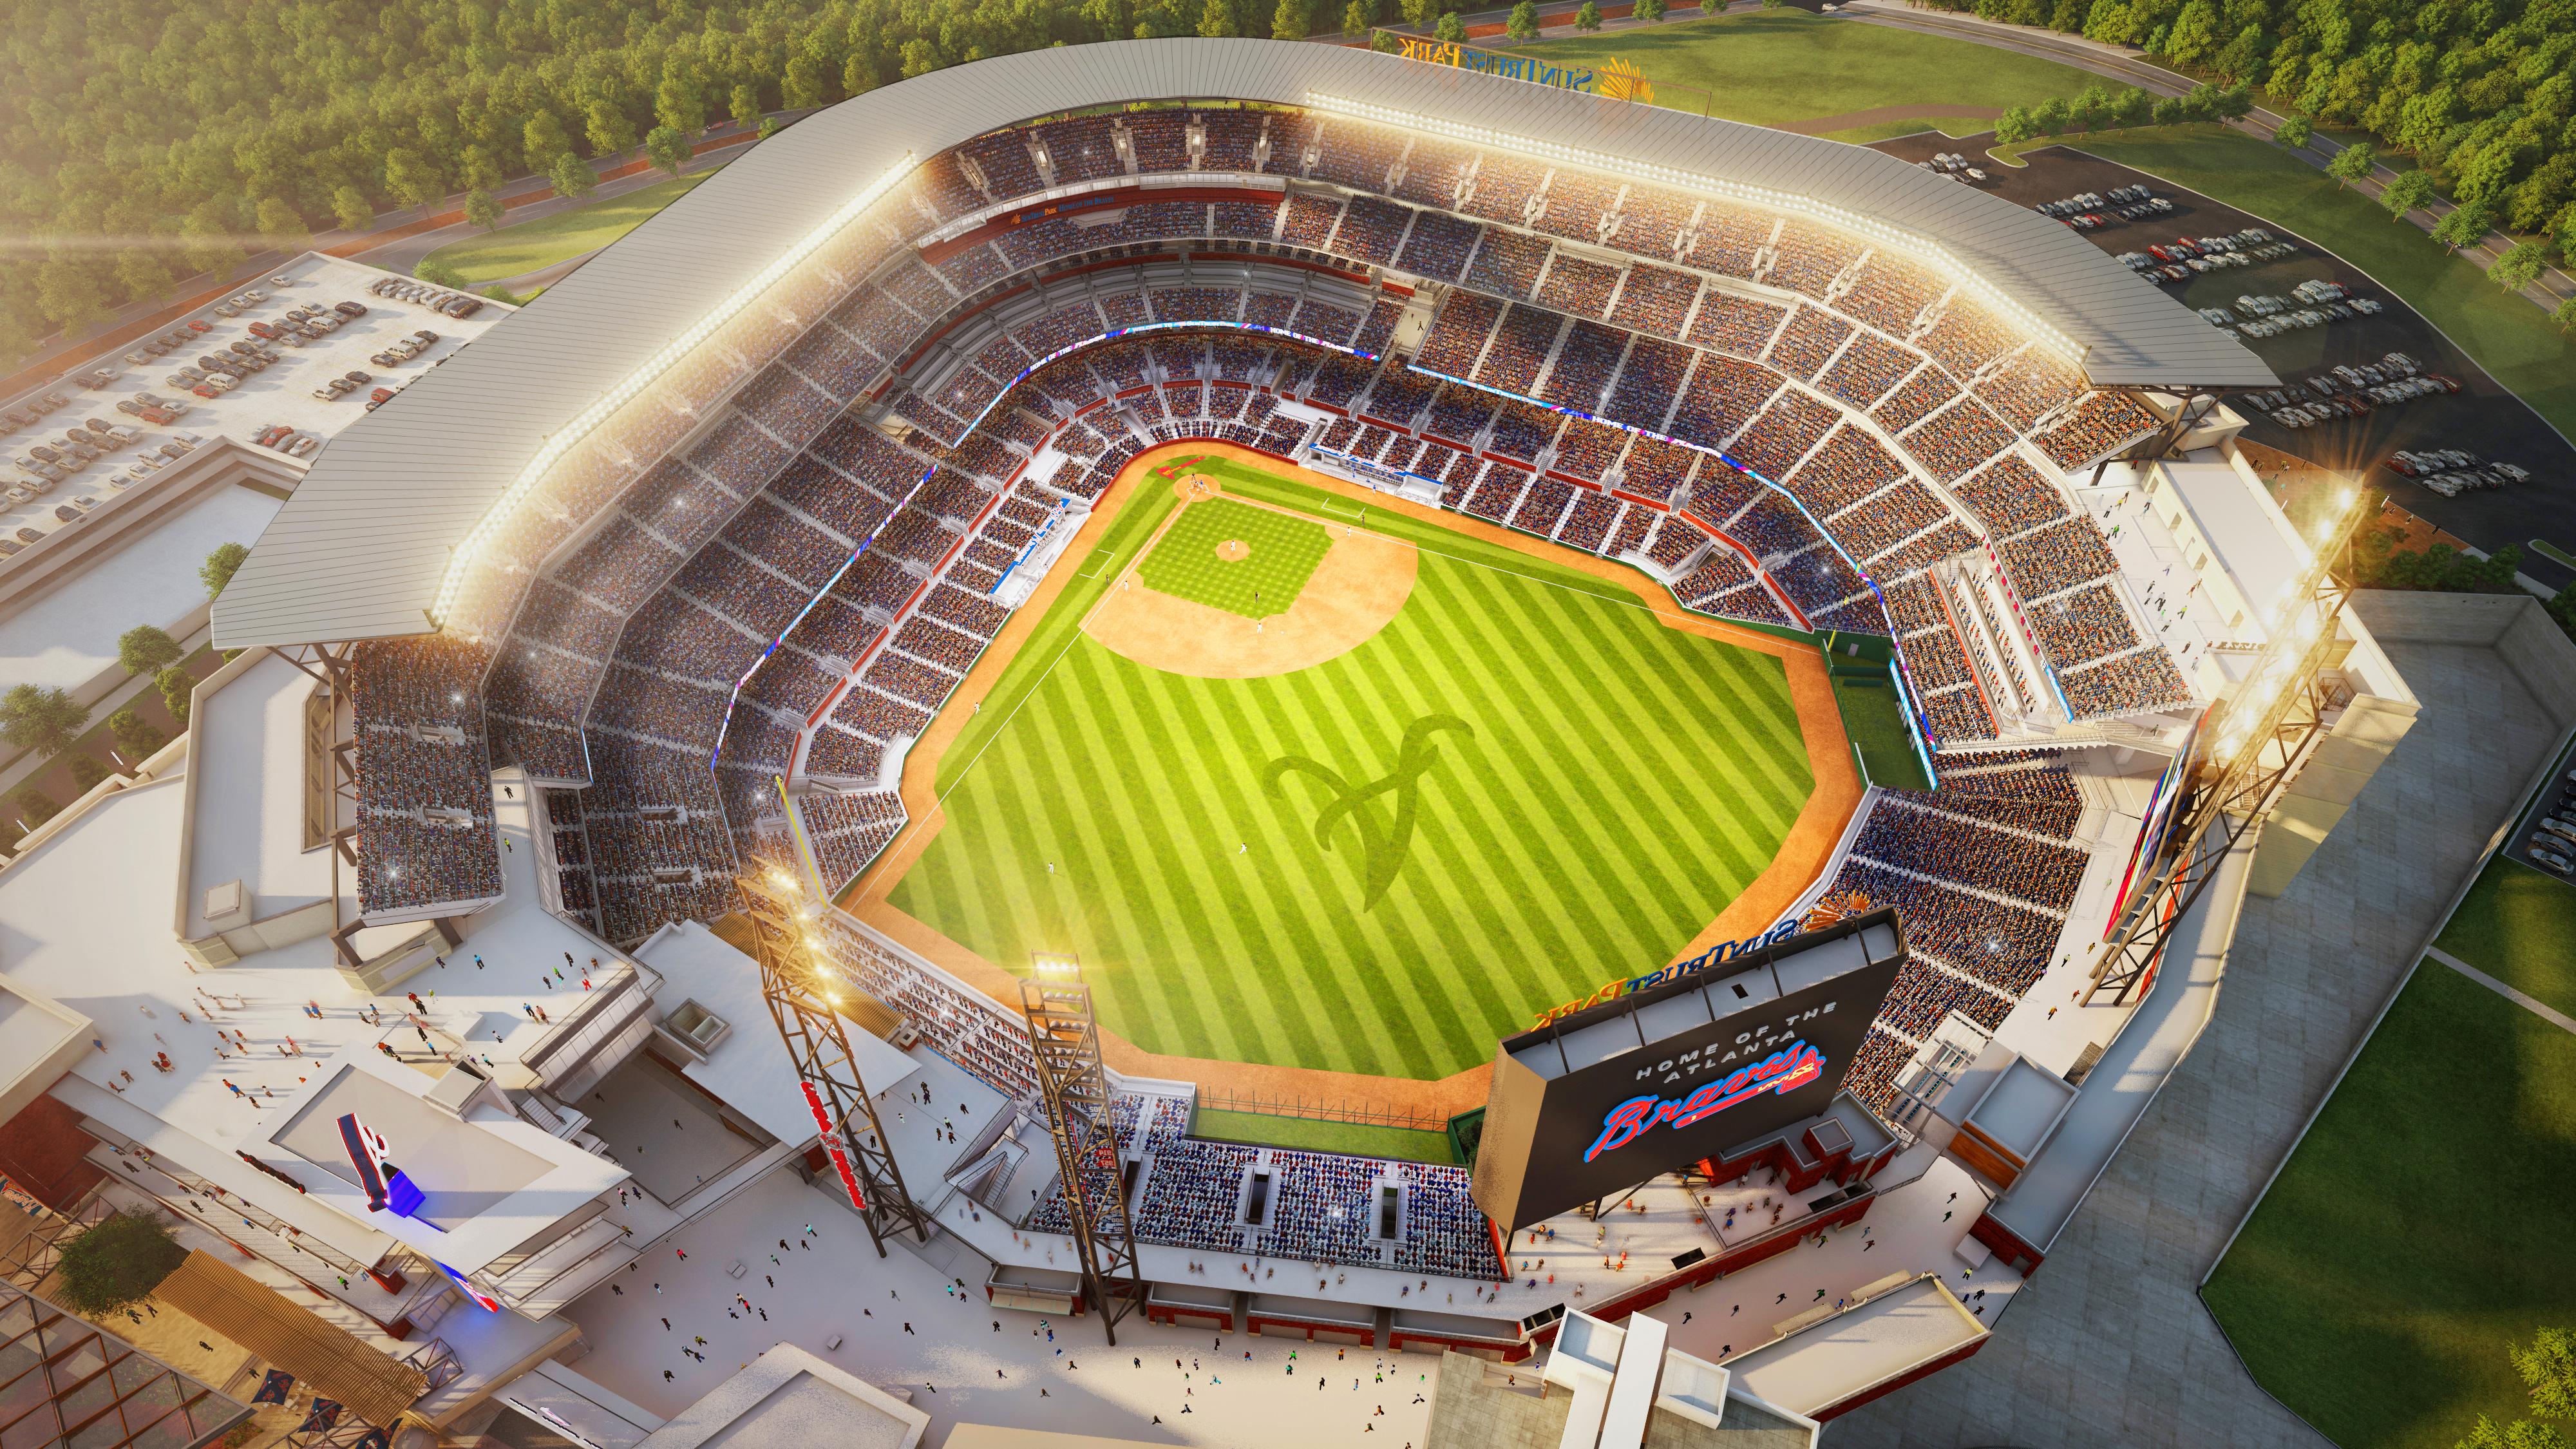 Image: Truist Park (Atlanta Braves Ballpark)